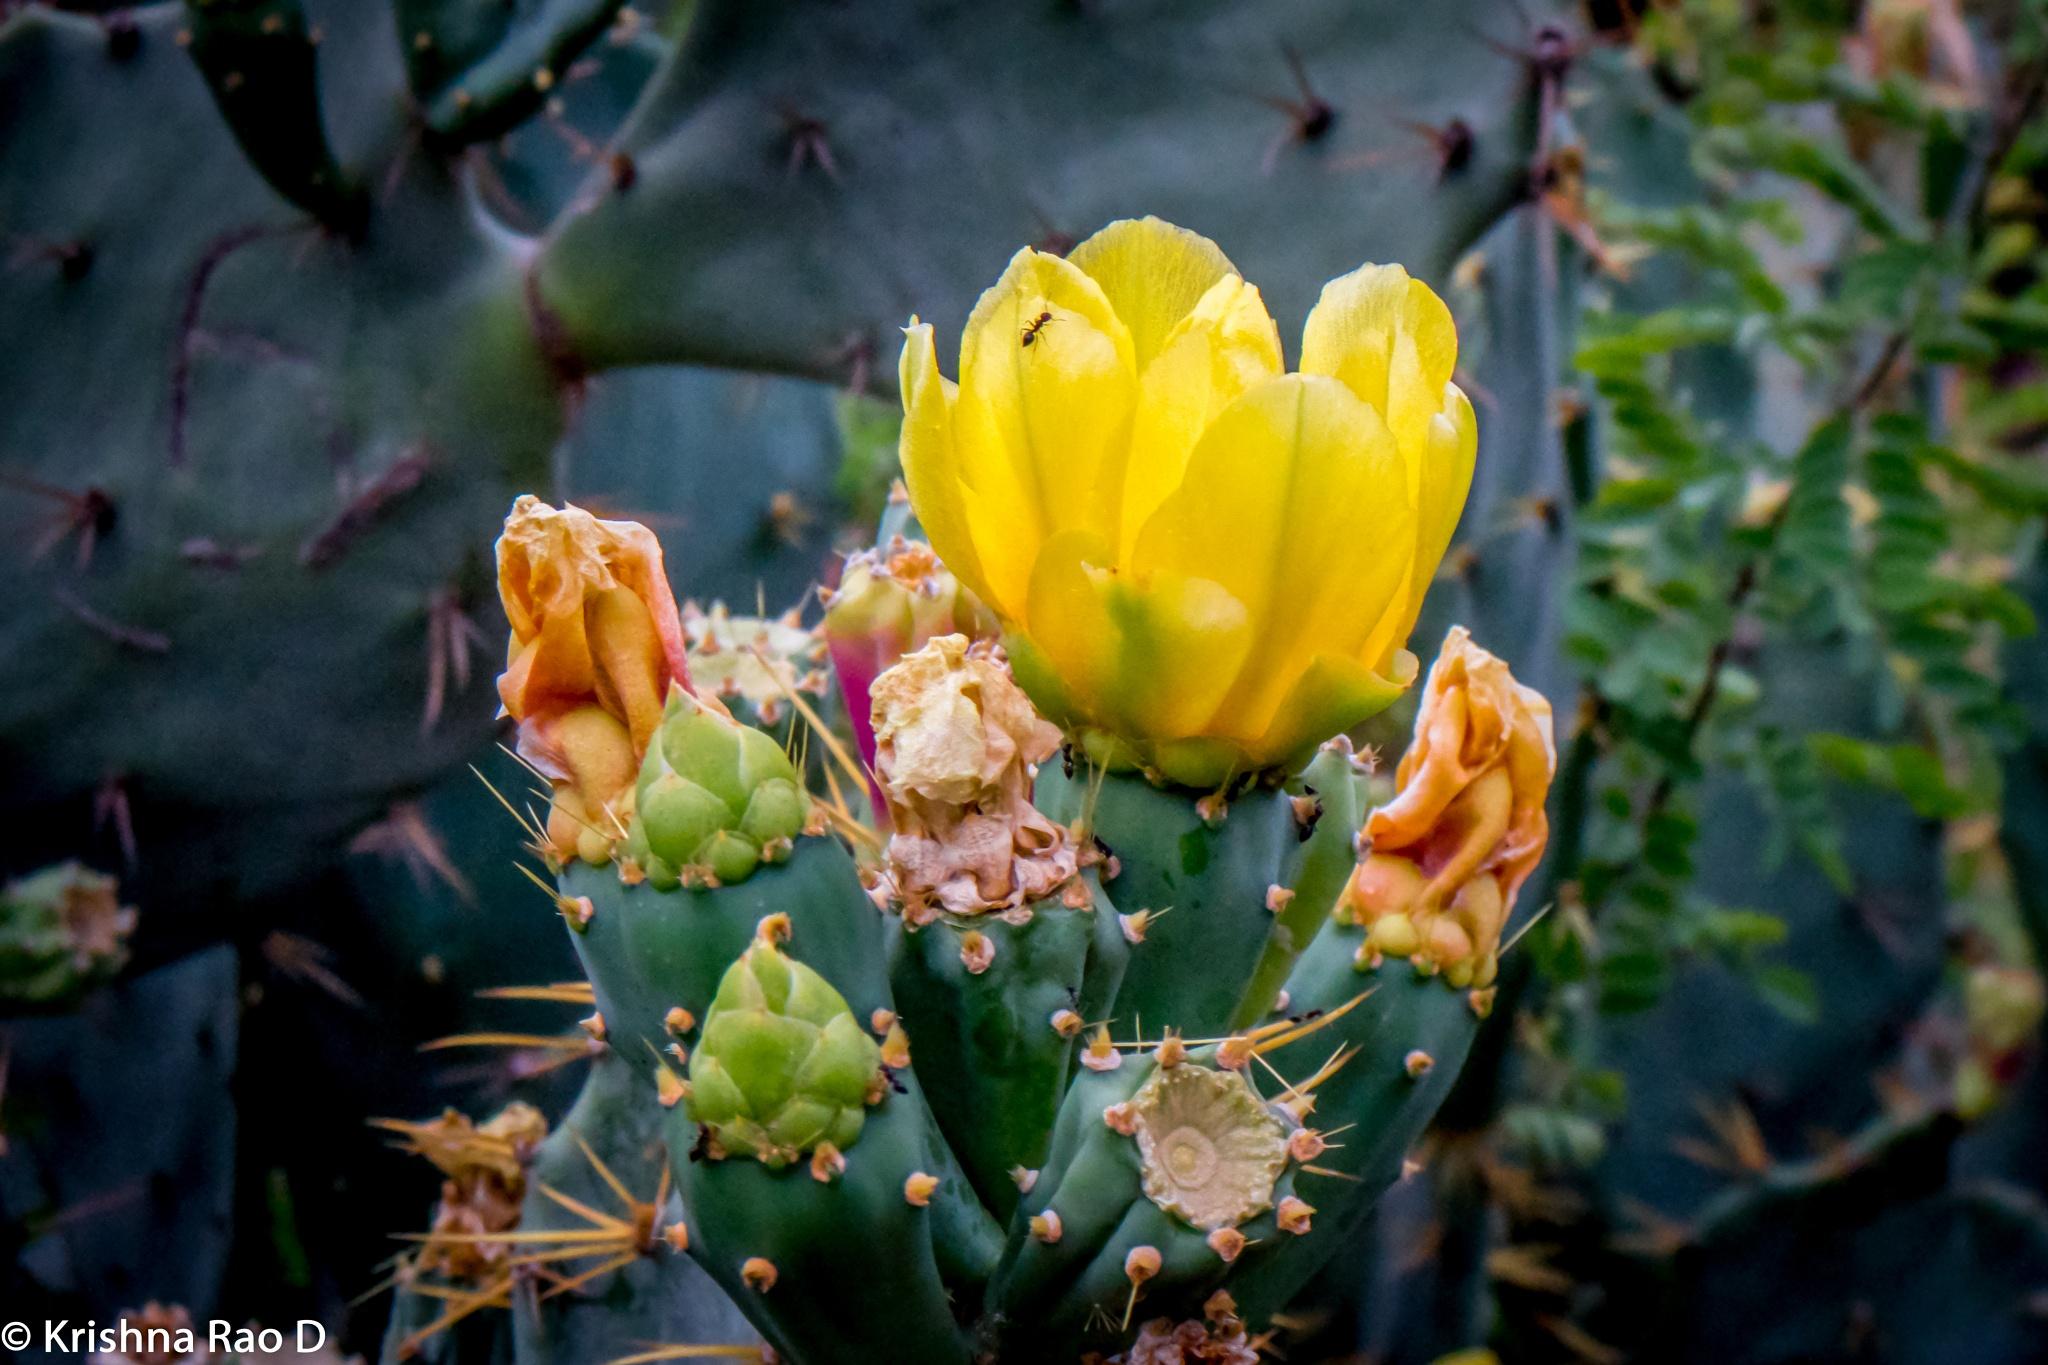 cactus flower by Krishna Rao D